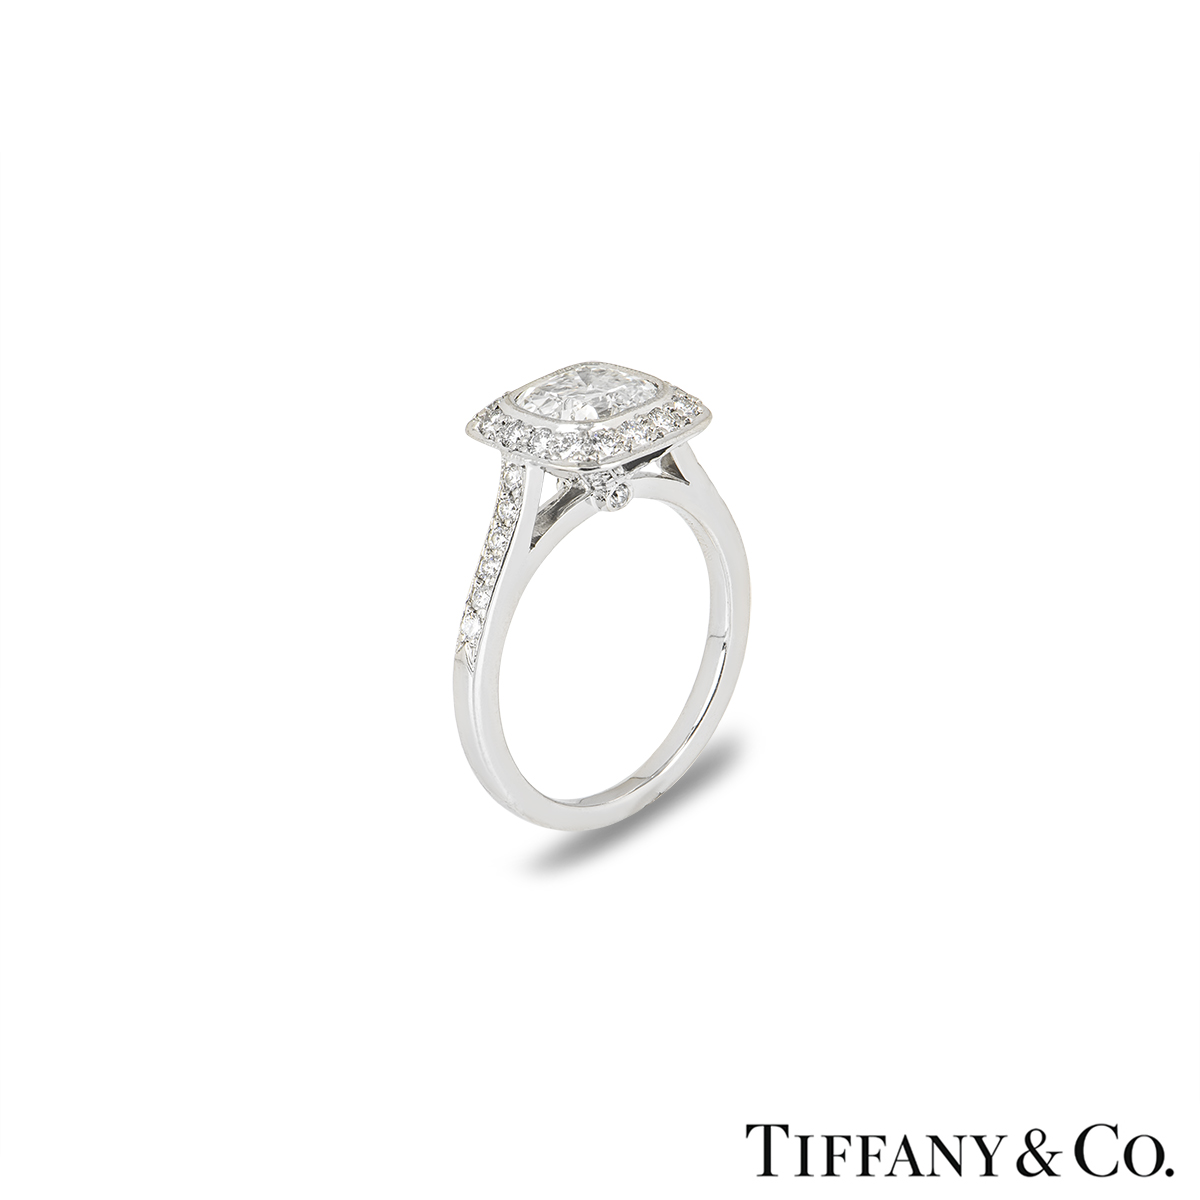 Tiffany & Co. Platinum Legacy Diamond Ring 1.34ct G/VS1